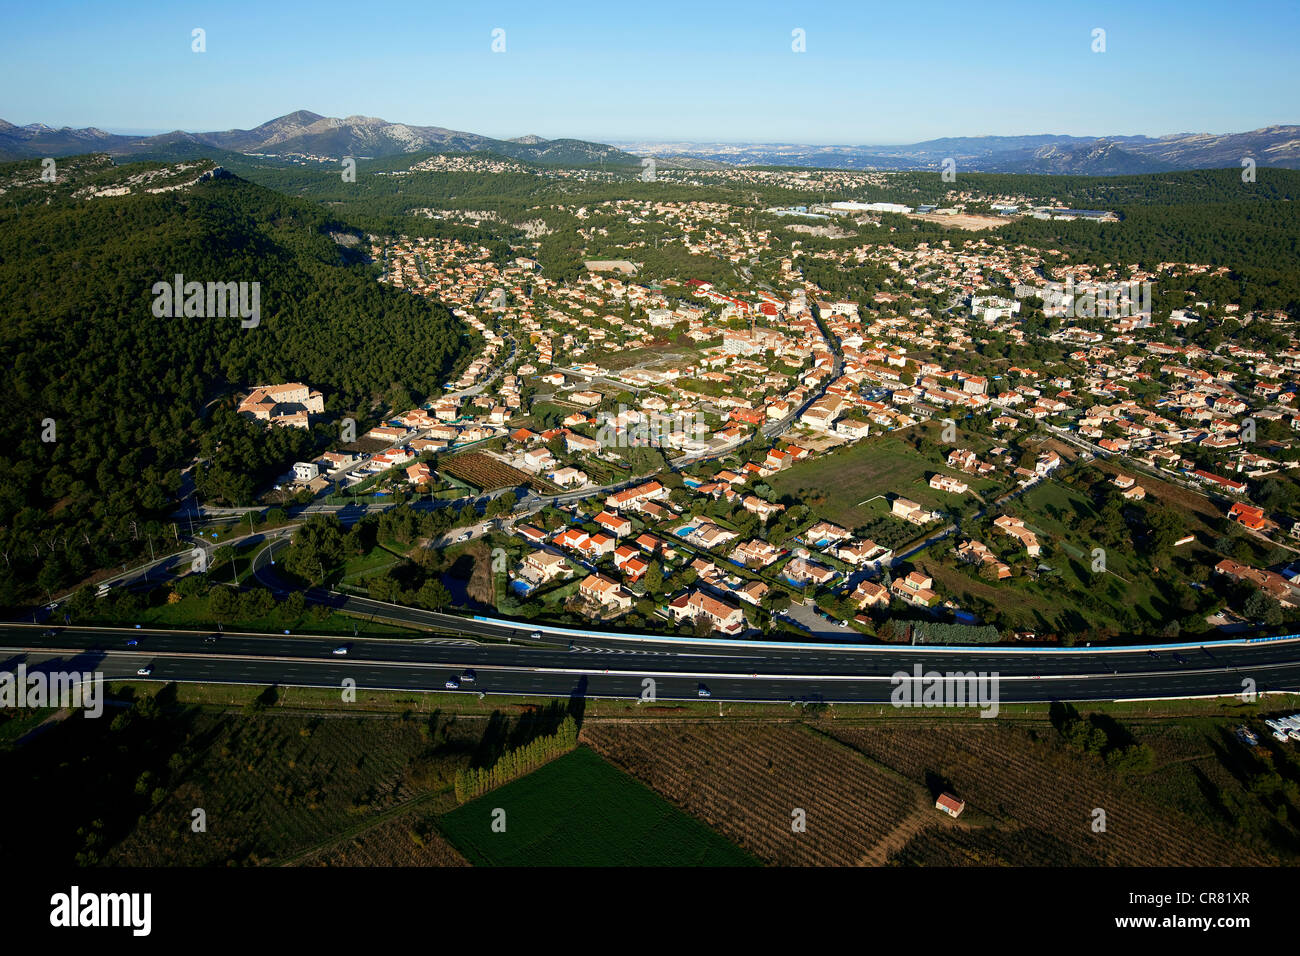 France, Bouches du Rhone, Roquefort la Bedoule, A50 motorway (aerial view) - Stock Image